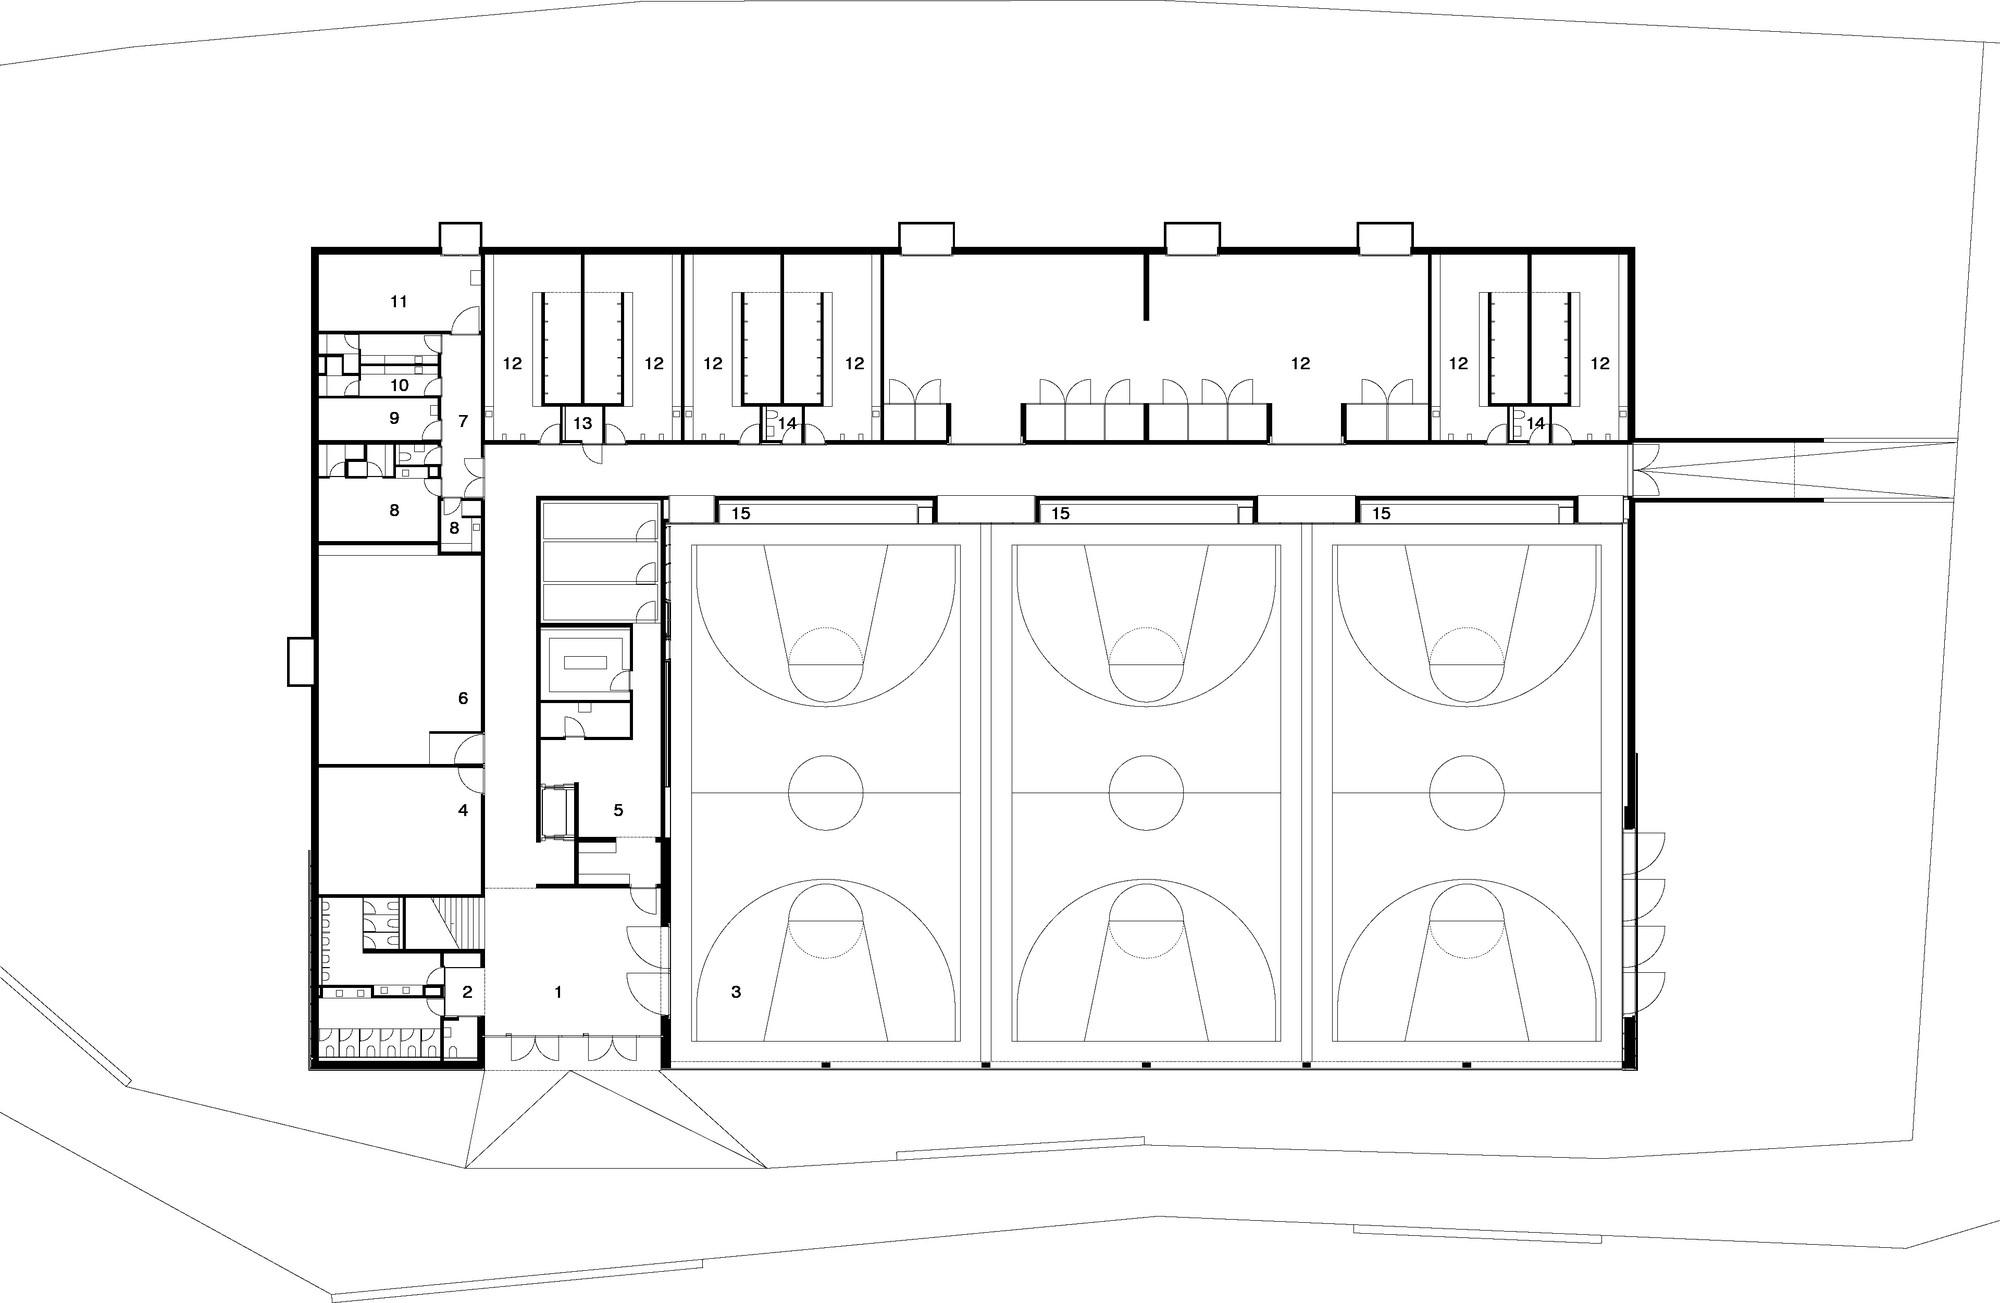 Best Kitchen Gallery: Gallery Of Lussy Sport Hall Virdis Architecture 17 of Sport Gym Floor Plan on rachelxblog.com